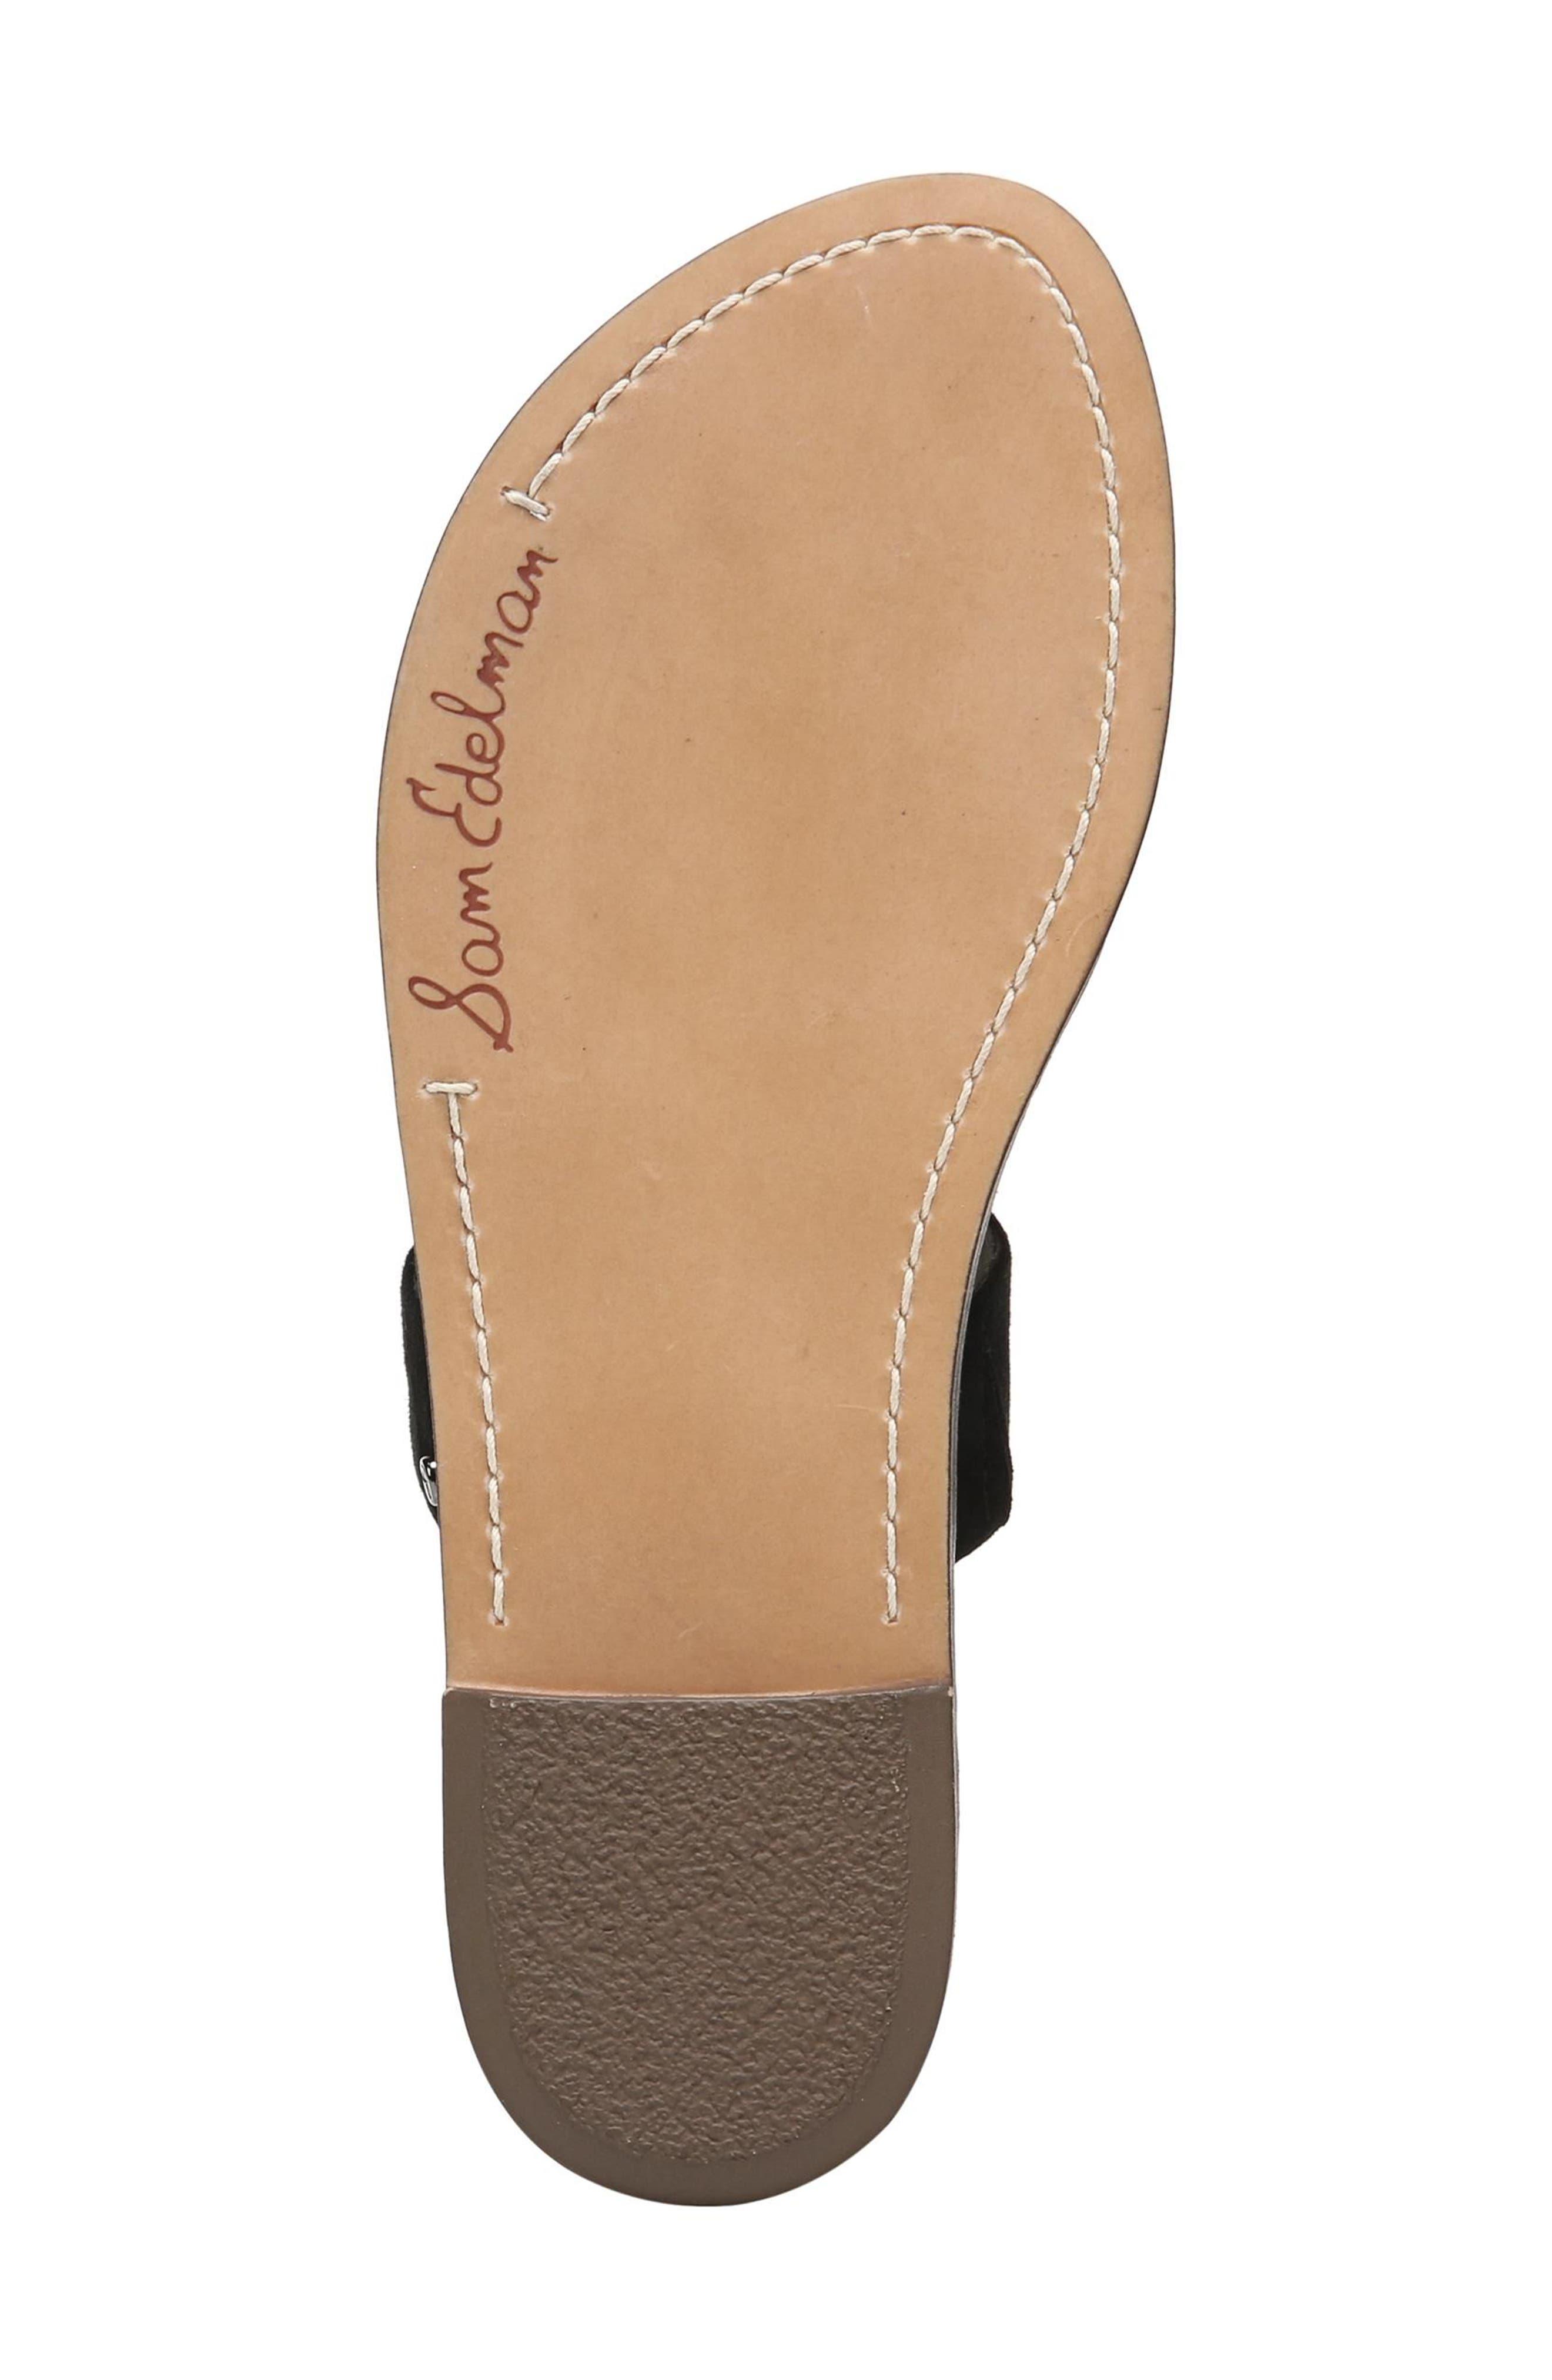 Gala Two Strap Slide Sandal,                             Alternate thumbnail 6, color,                             BLACK SUEDE